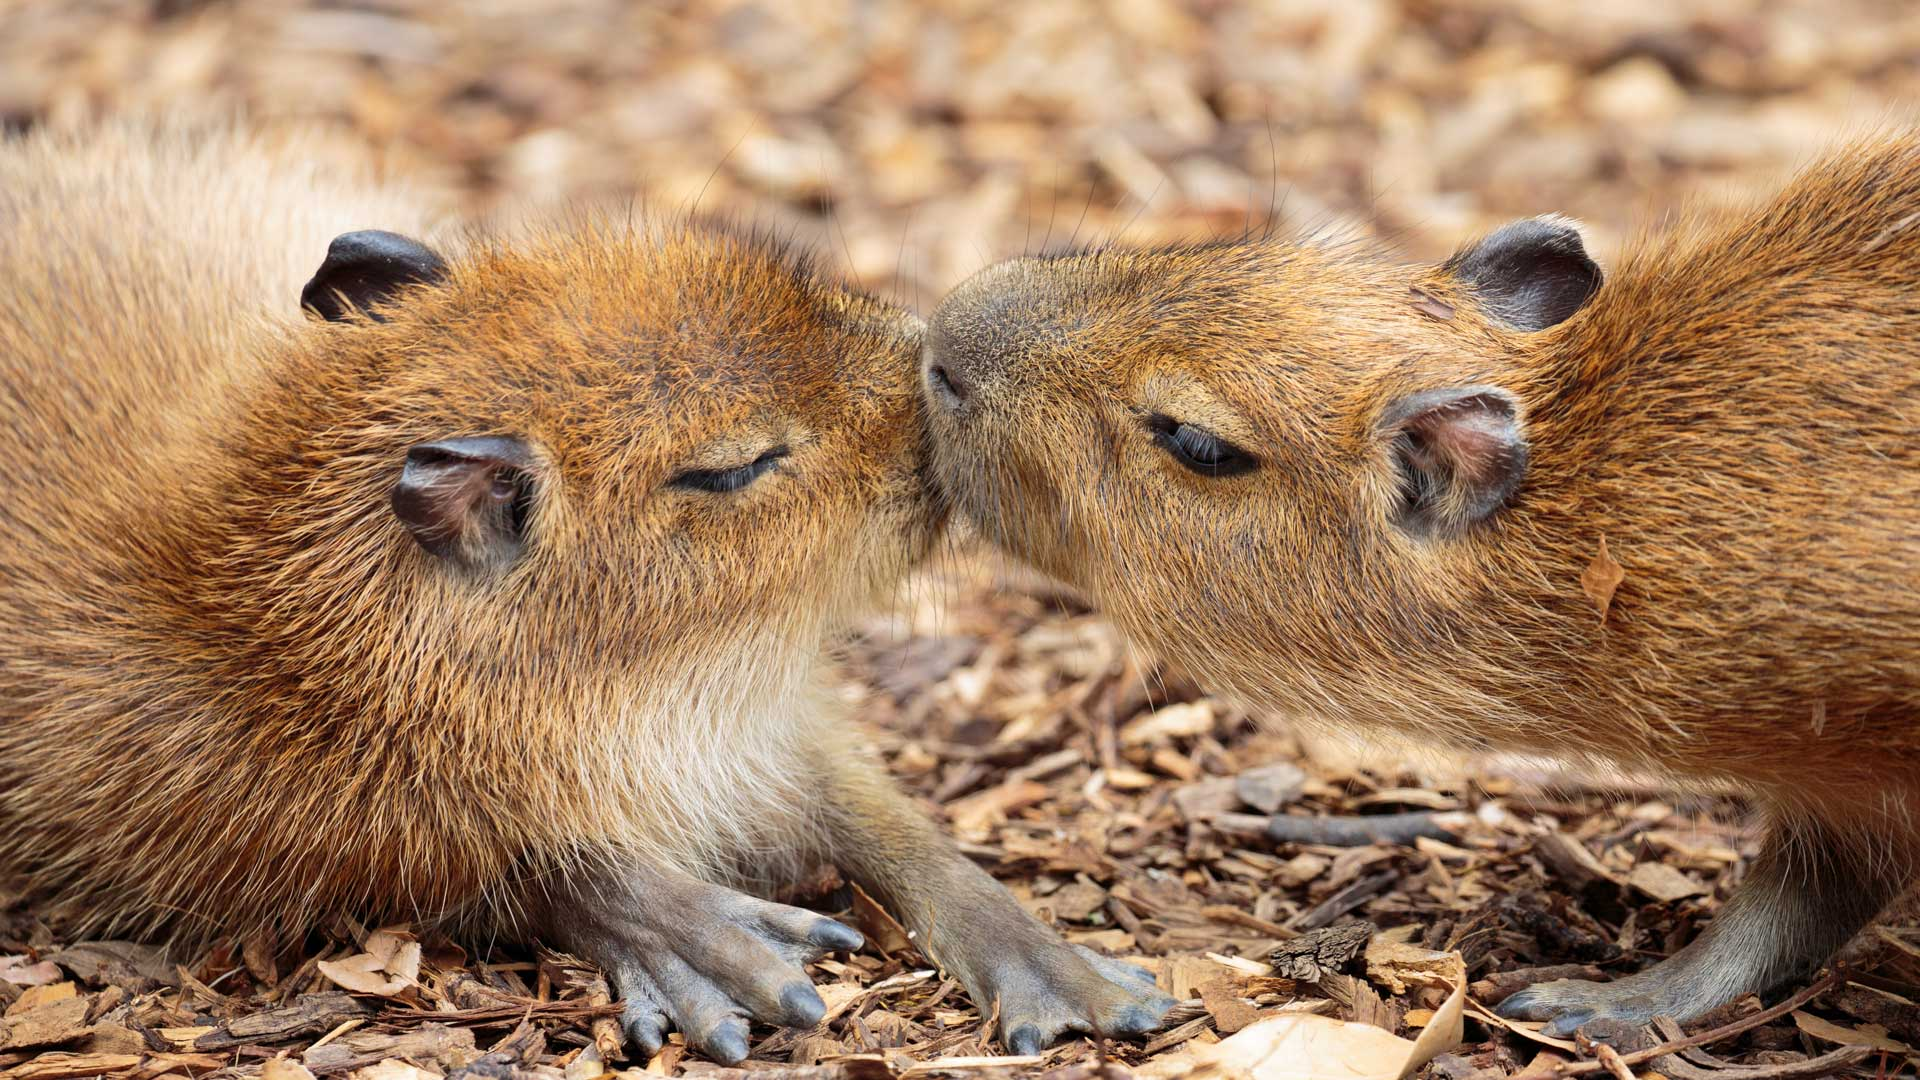 https://rfacdn.nz/zoo/assets/media/capybara-gallery-3.jpg